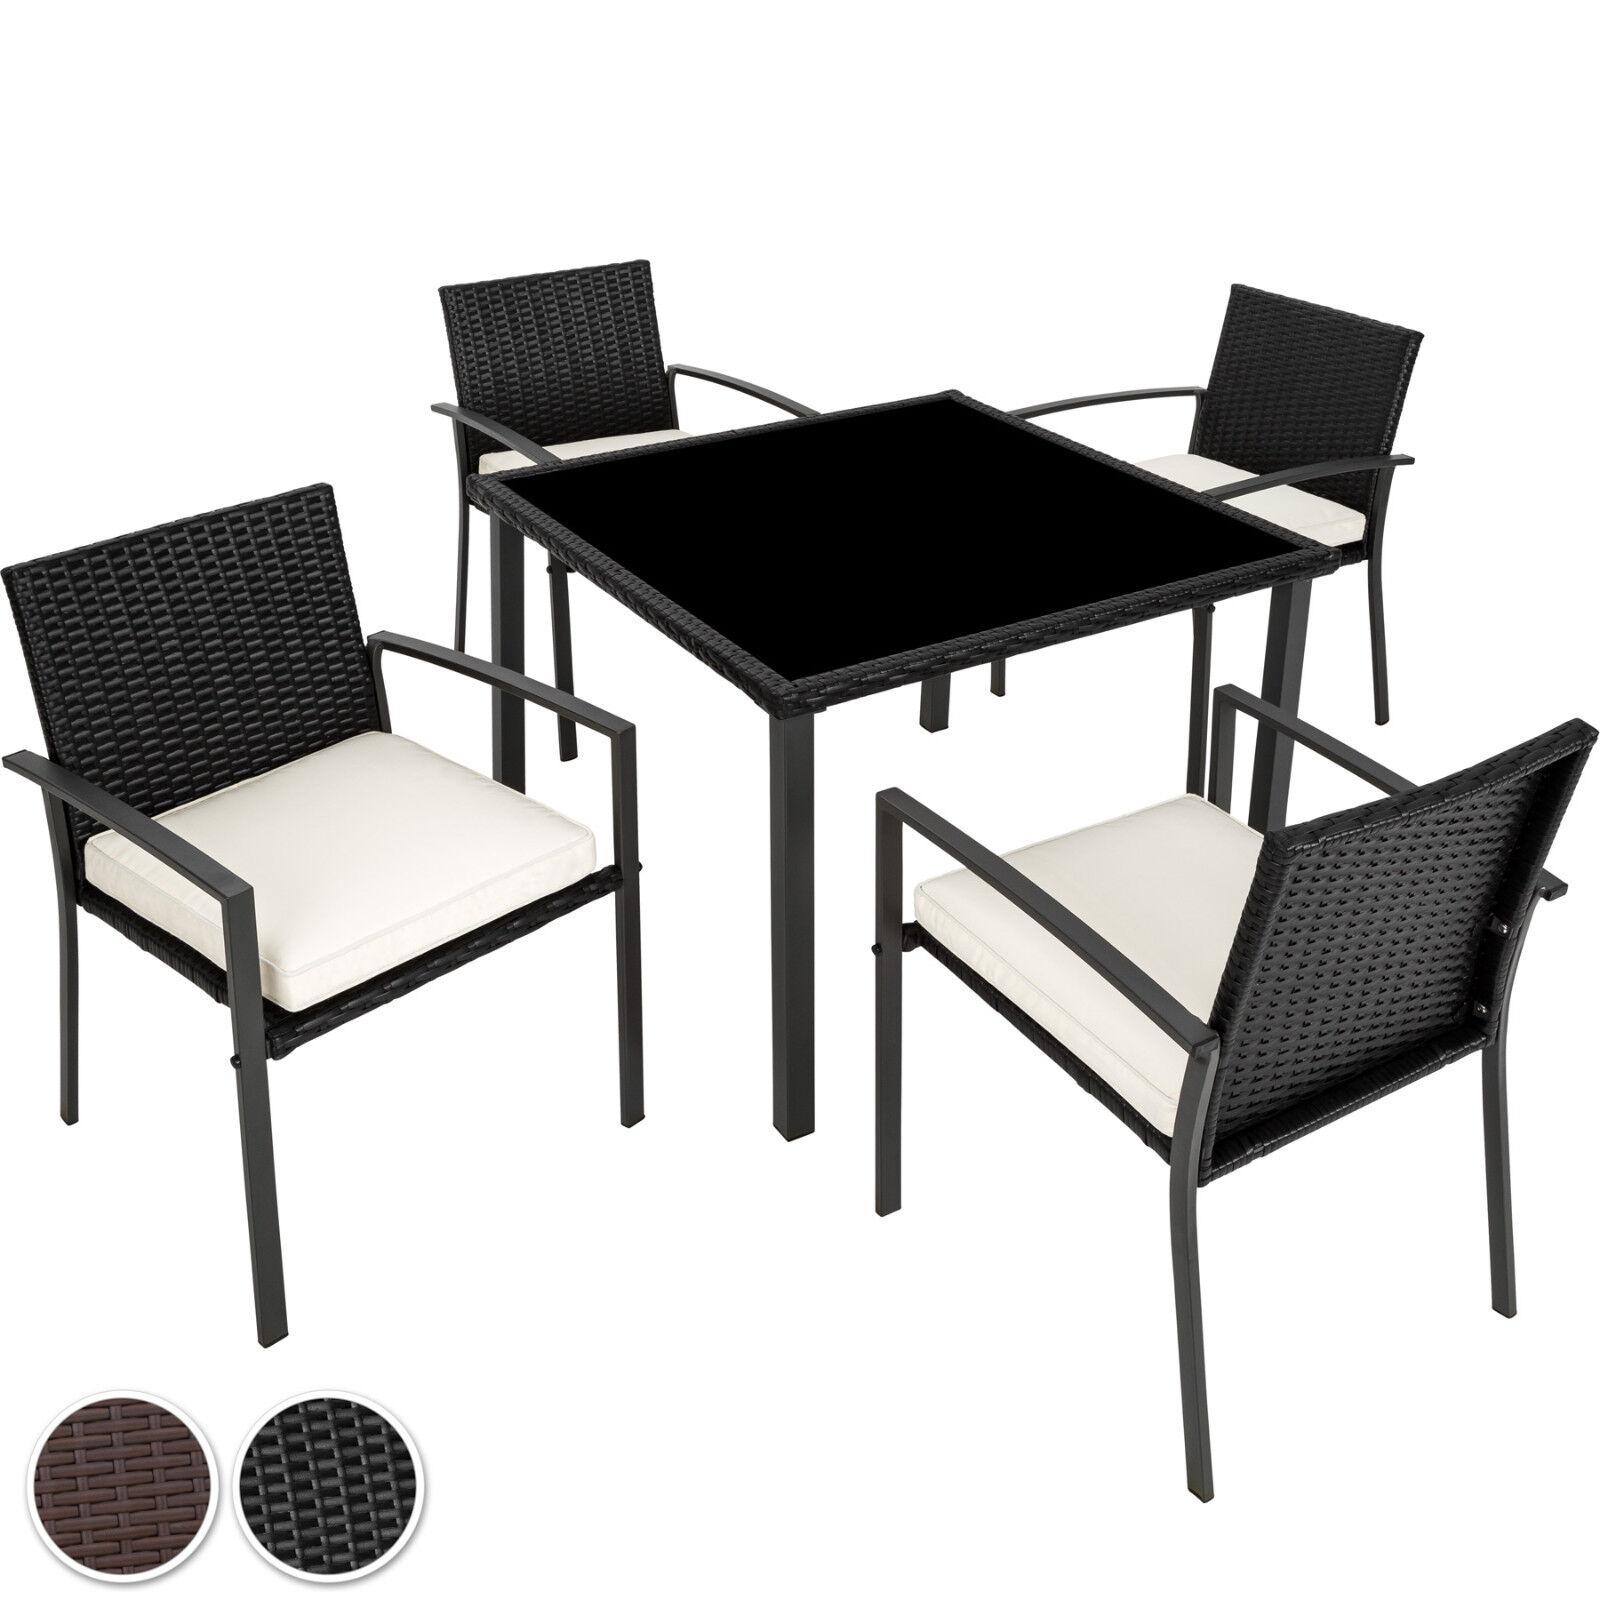 Poly Rattan Gartenmöbel Set Garnitur Sitzgarnitur Stuh…  